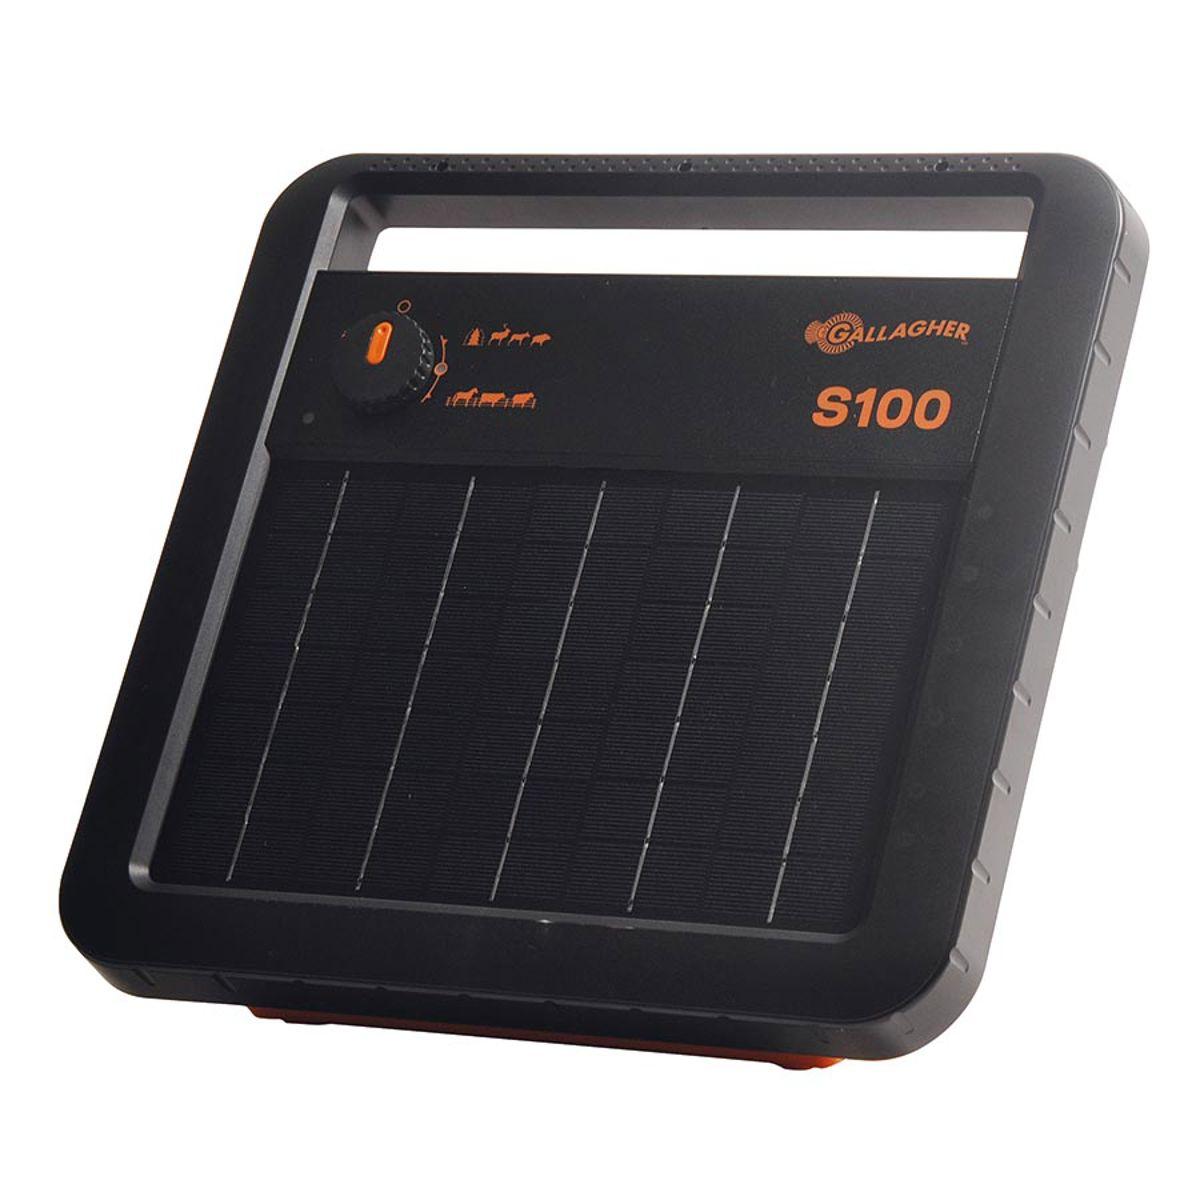 Gallagher s100 inclusief batterij (6v -